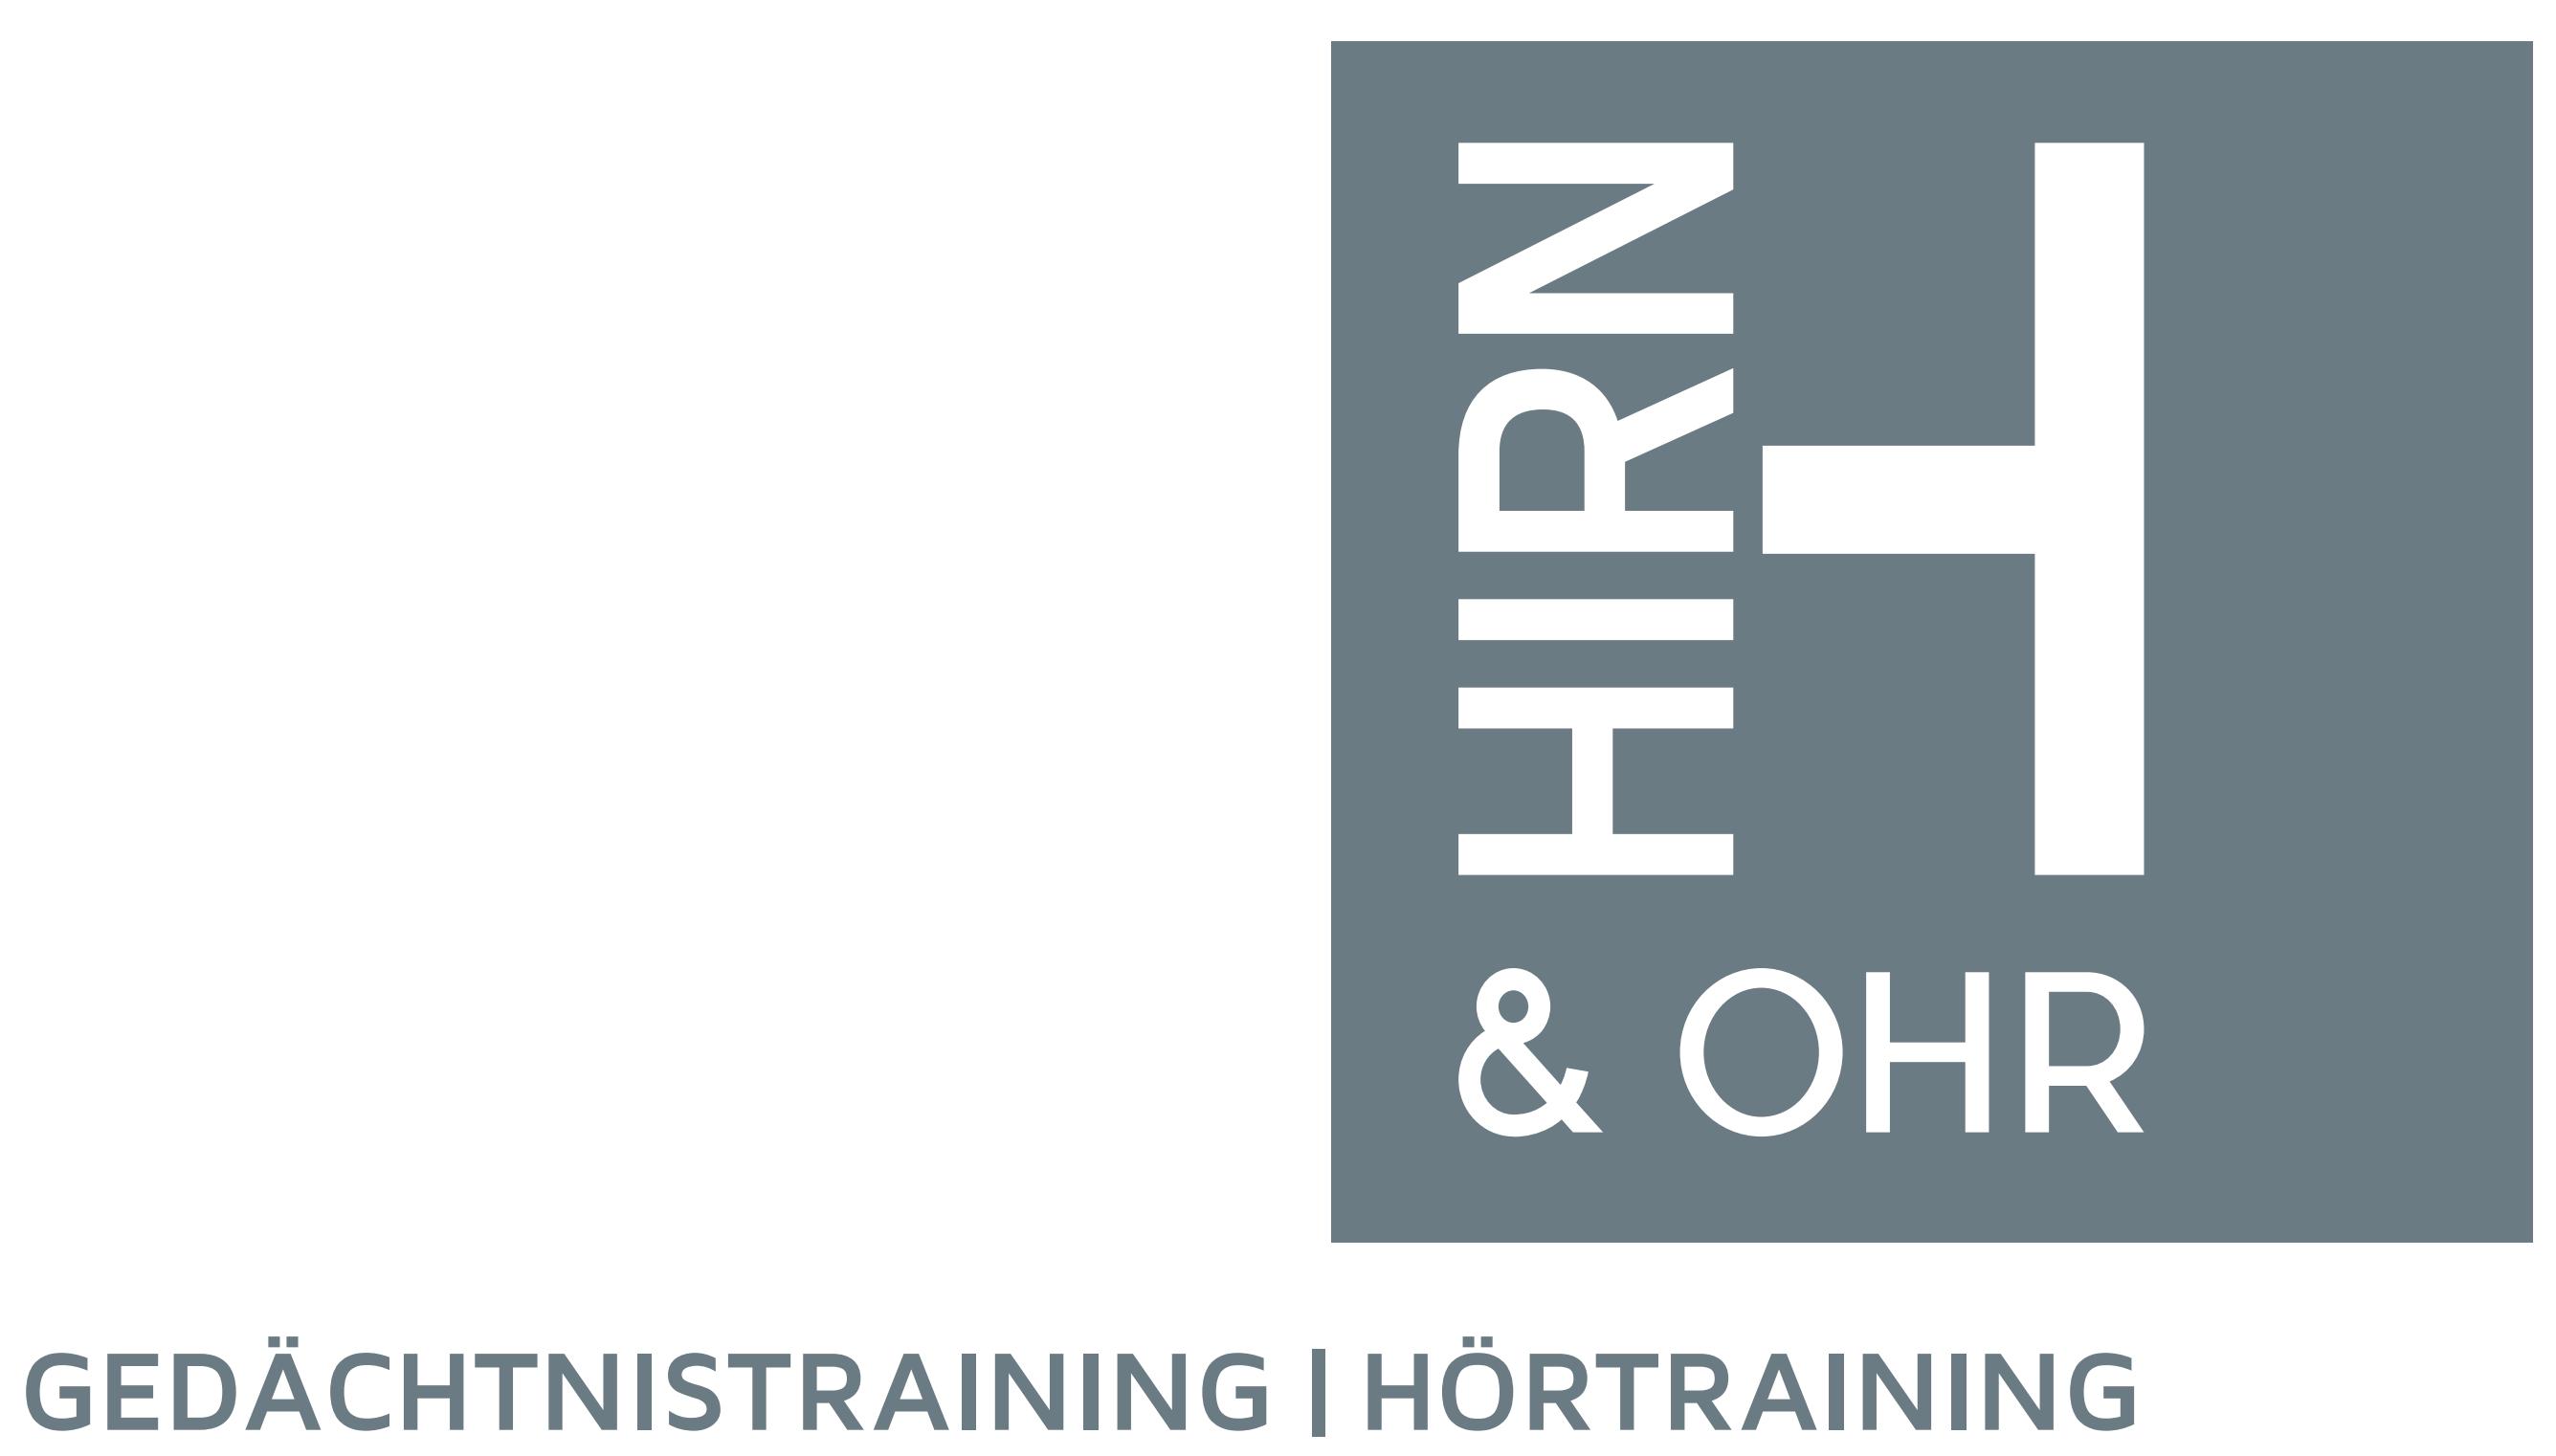 Hirn & Ohr